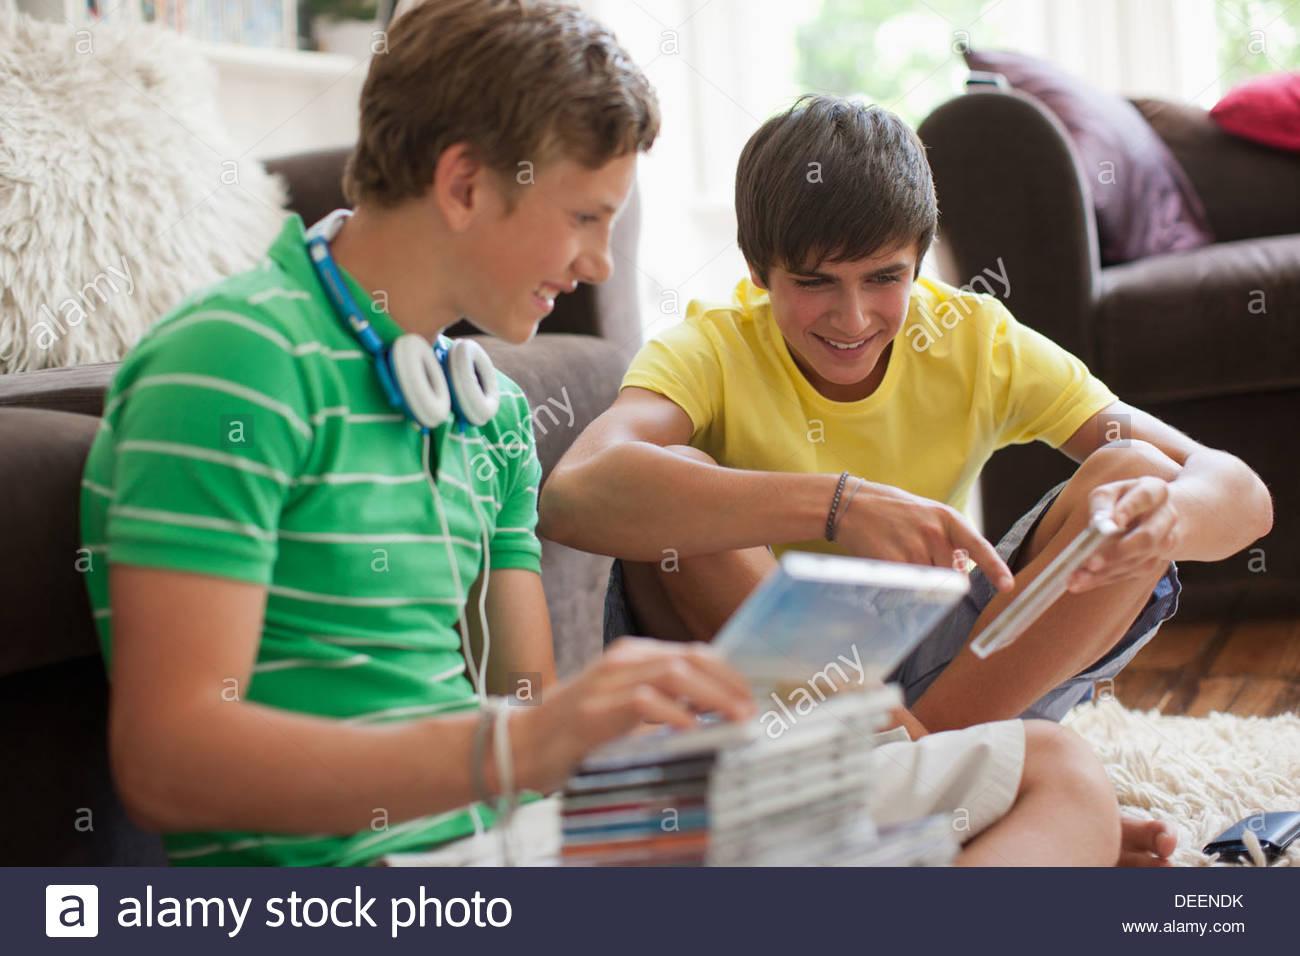 Teenage boys looking at cd roms - Stock Image